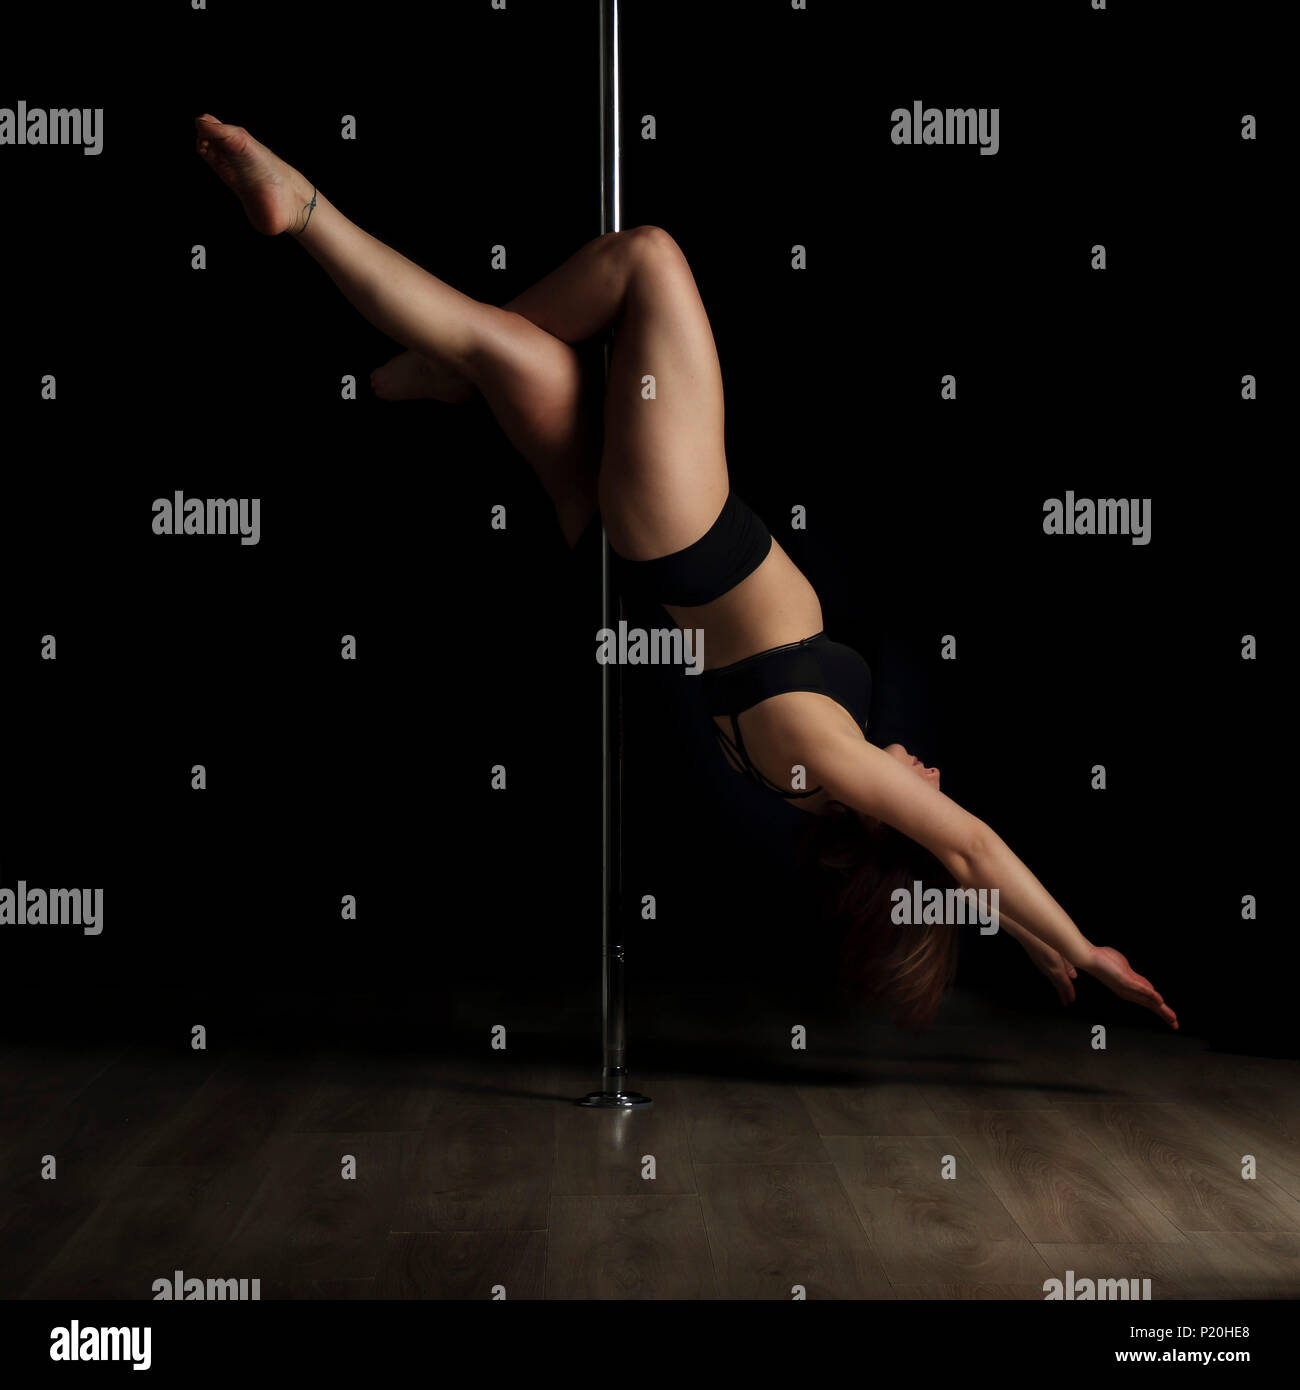 Anatomy Of Dance Stock Photos Anatomy Of Dance Stock Images Alamy